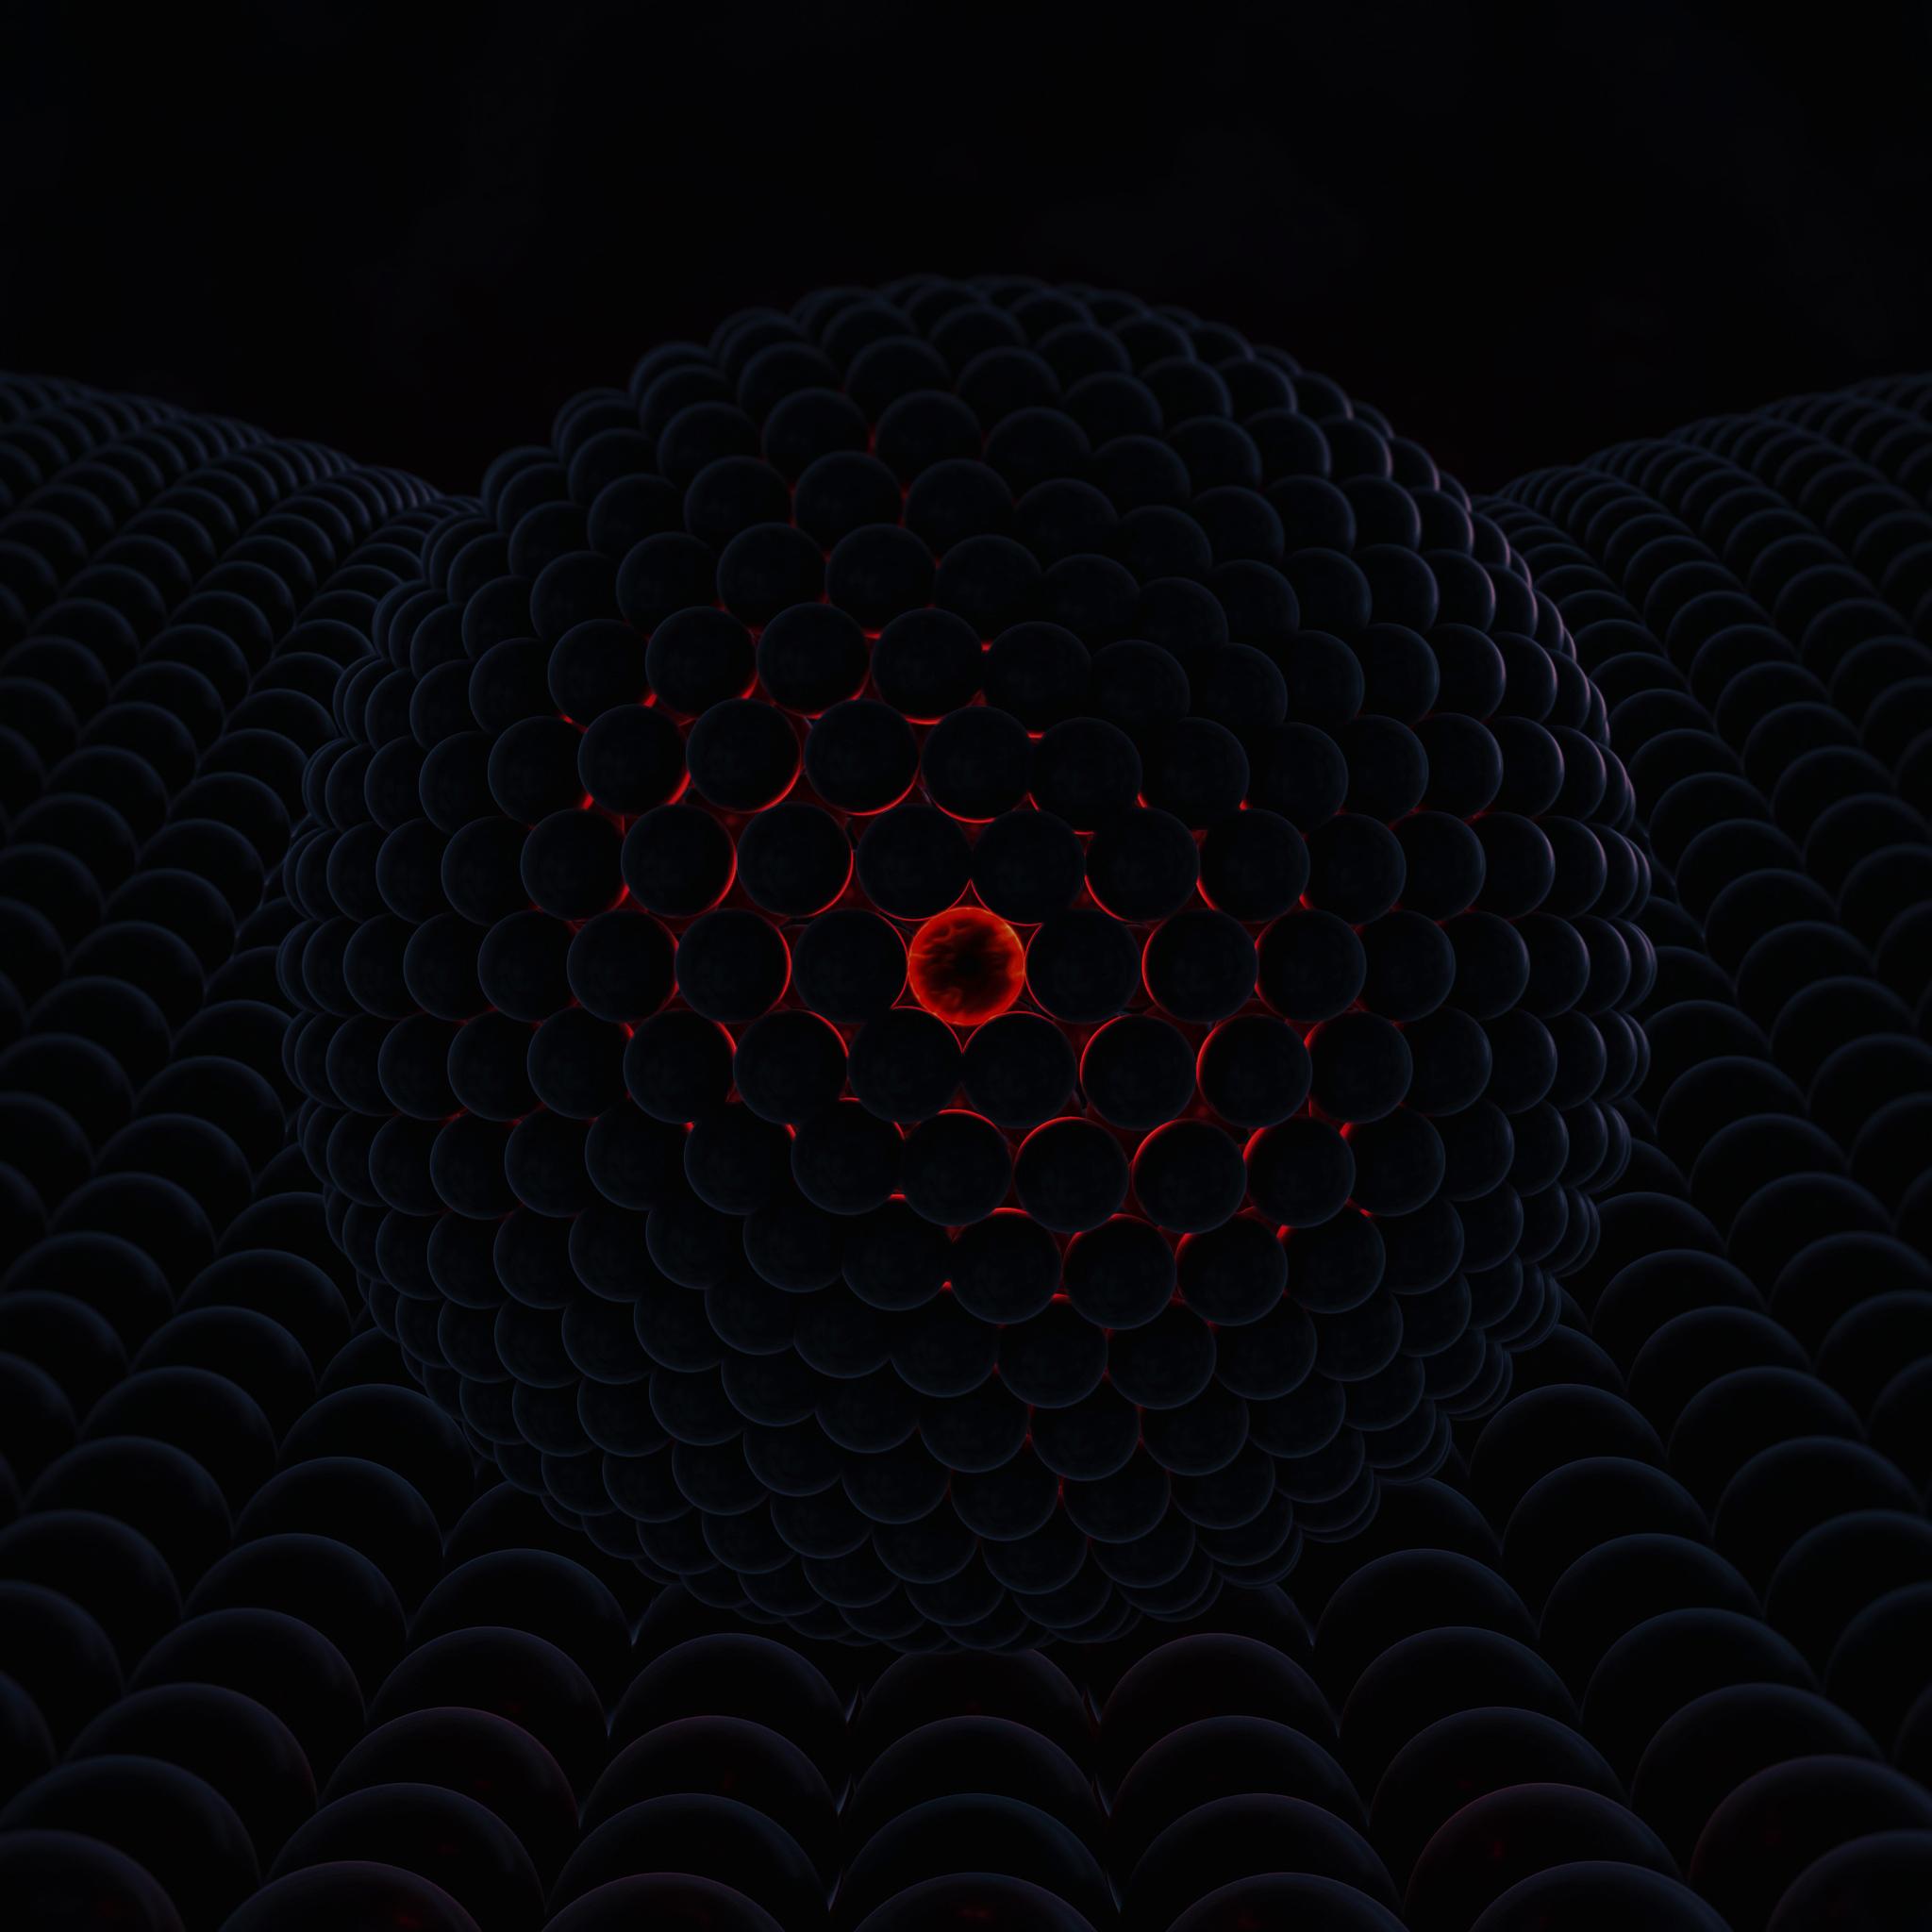 3d-abstract-red-cgi-digital-art-4k-hr.jpg